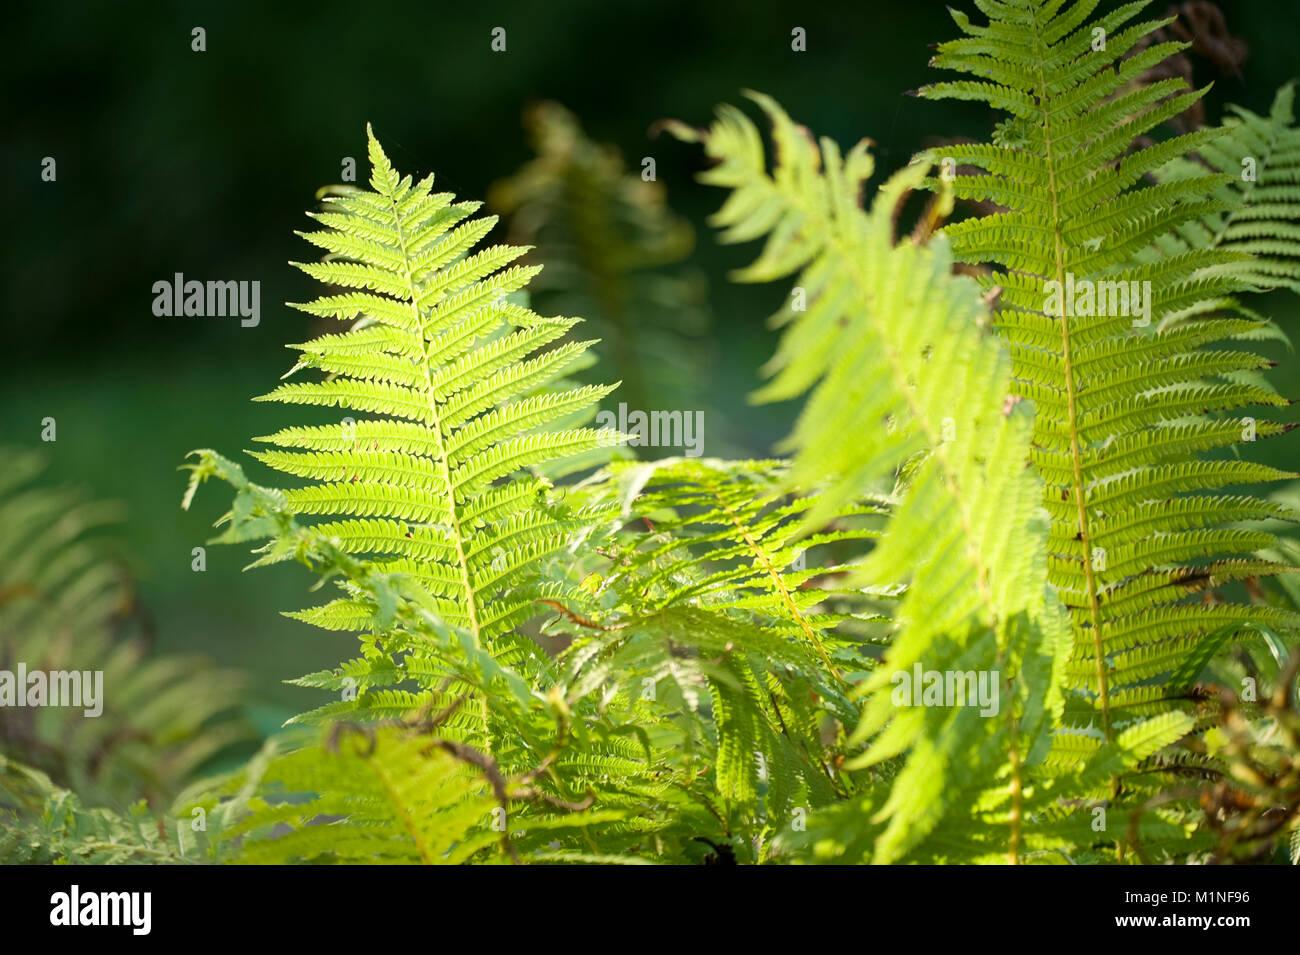 Goldschuppenfarn Dryopteris affinis